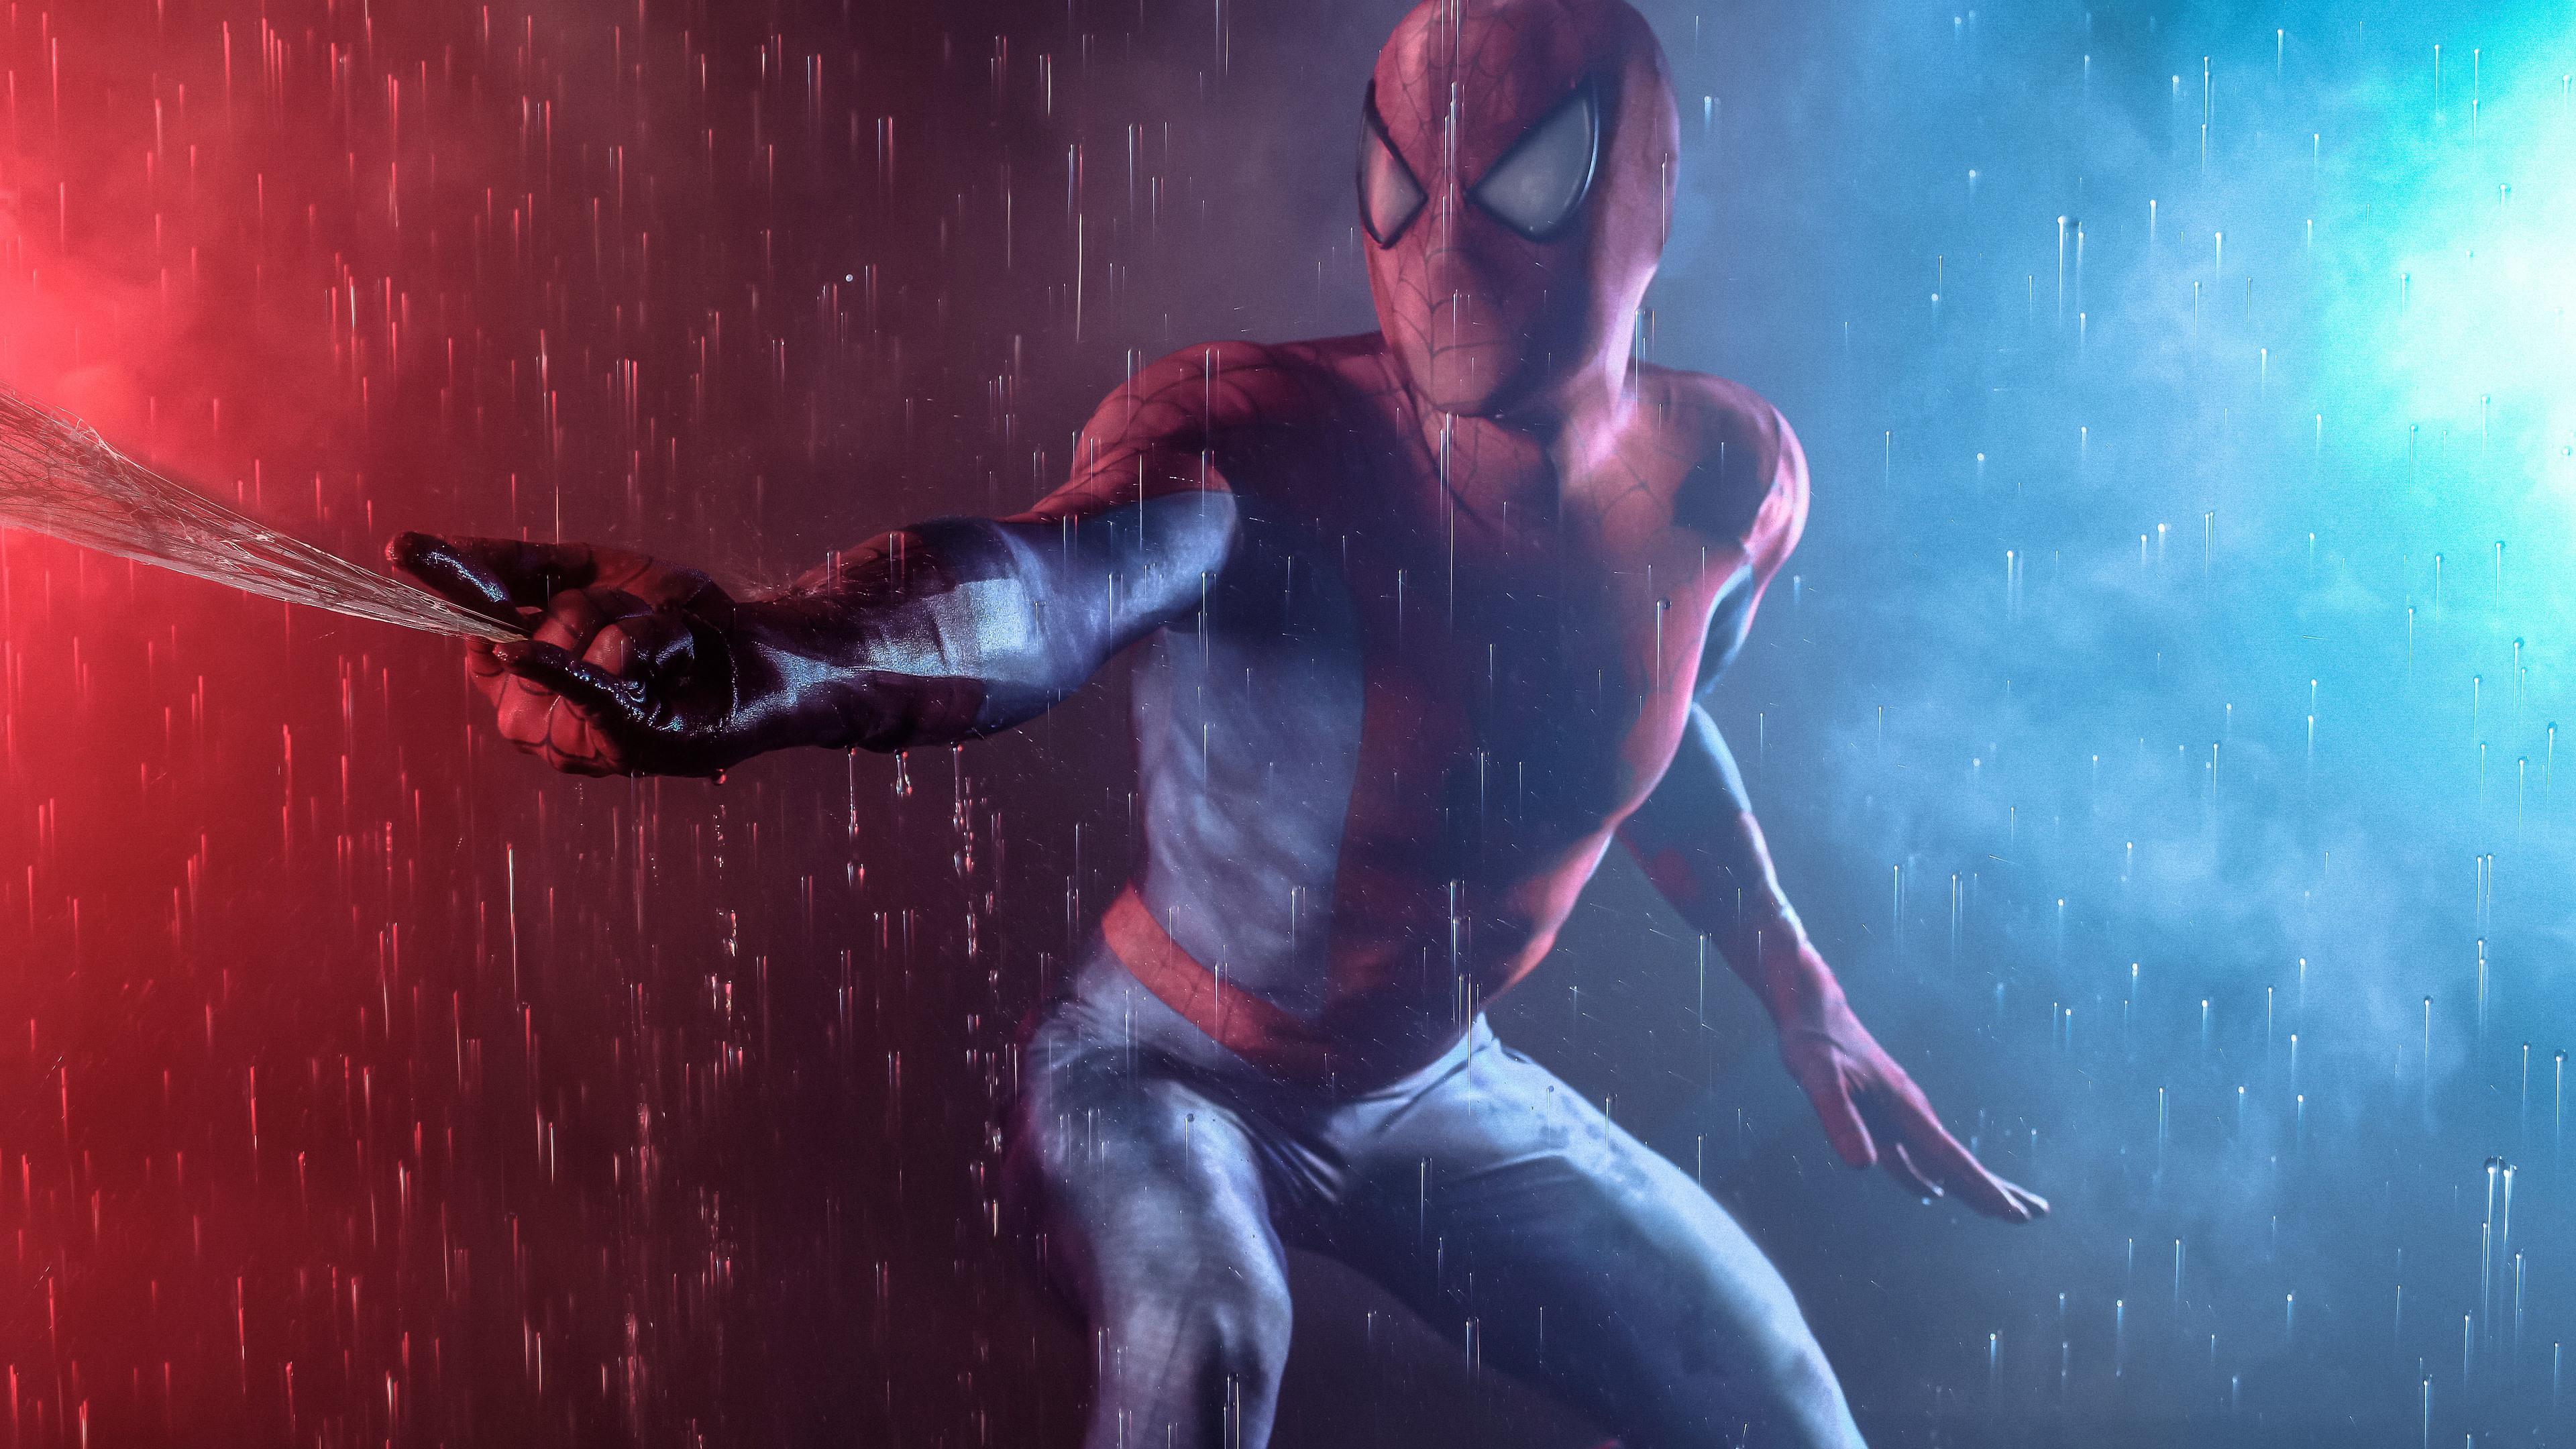 spiderman cosplay 1536522492 - Spiderman Cosplay - superheroes wallpapers, spiderman wallpapers, hd-wallpapers, deviantart wallpapers, cosplay wallpapers, artist wallpapers, 5k wallpapers, 4k-wallpapers